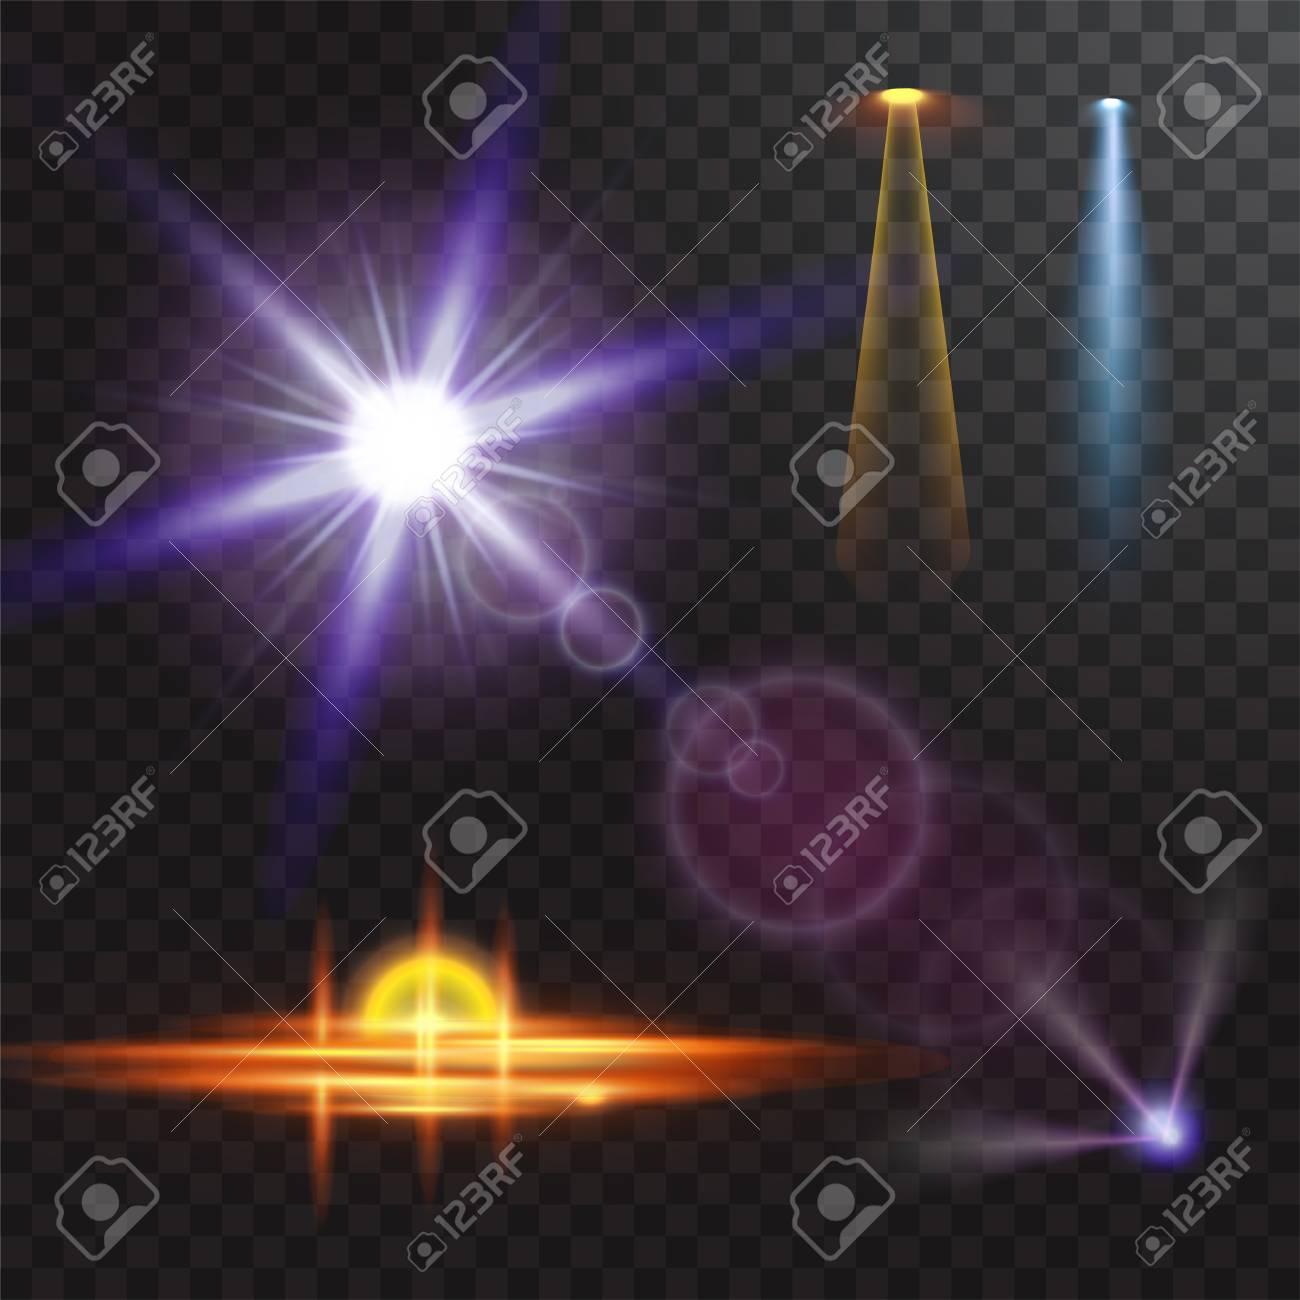 Vector Illustration Of Light Sources Concert Lighting Stage